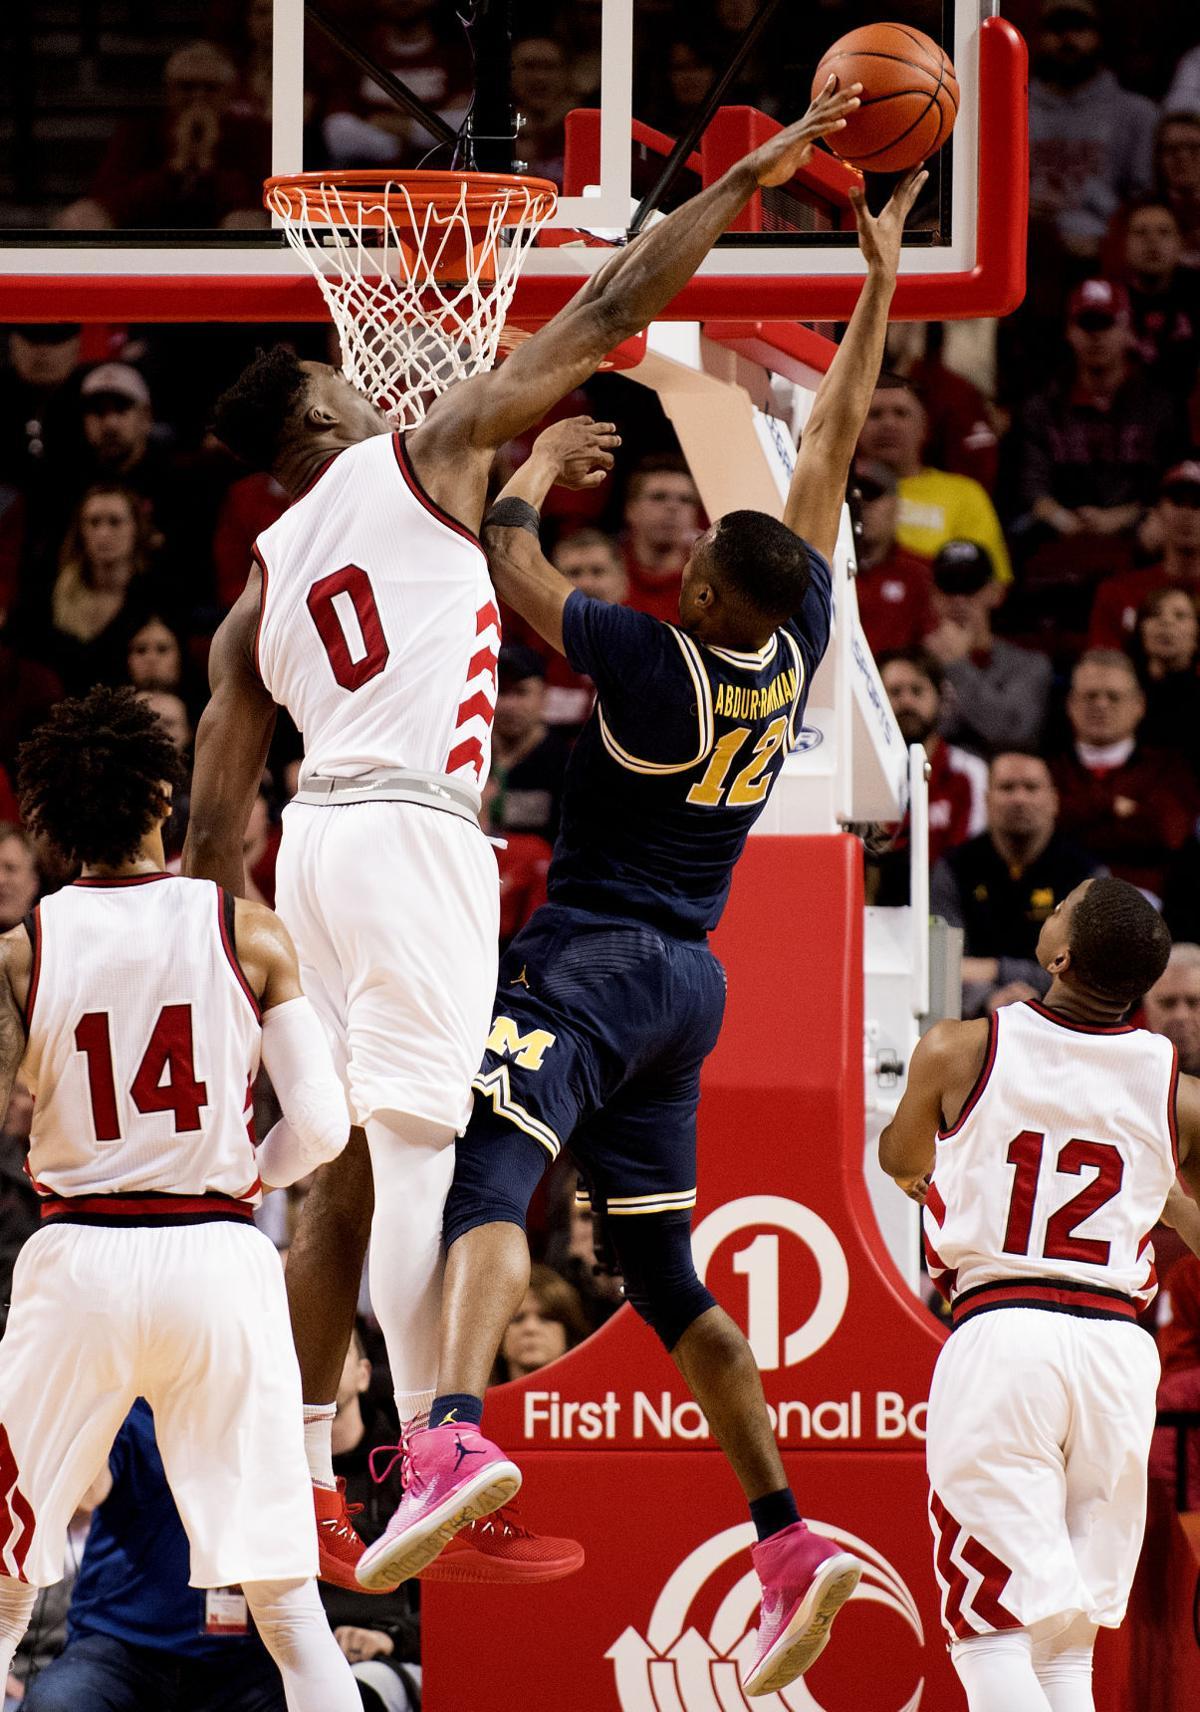 Michigan Basketball vs. Nebraska, 1/18/19